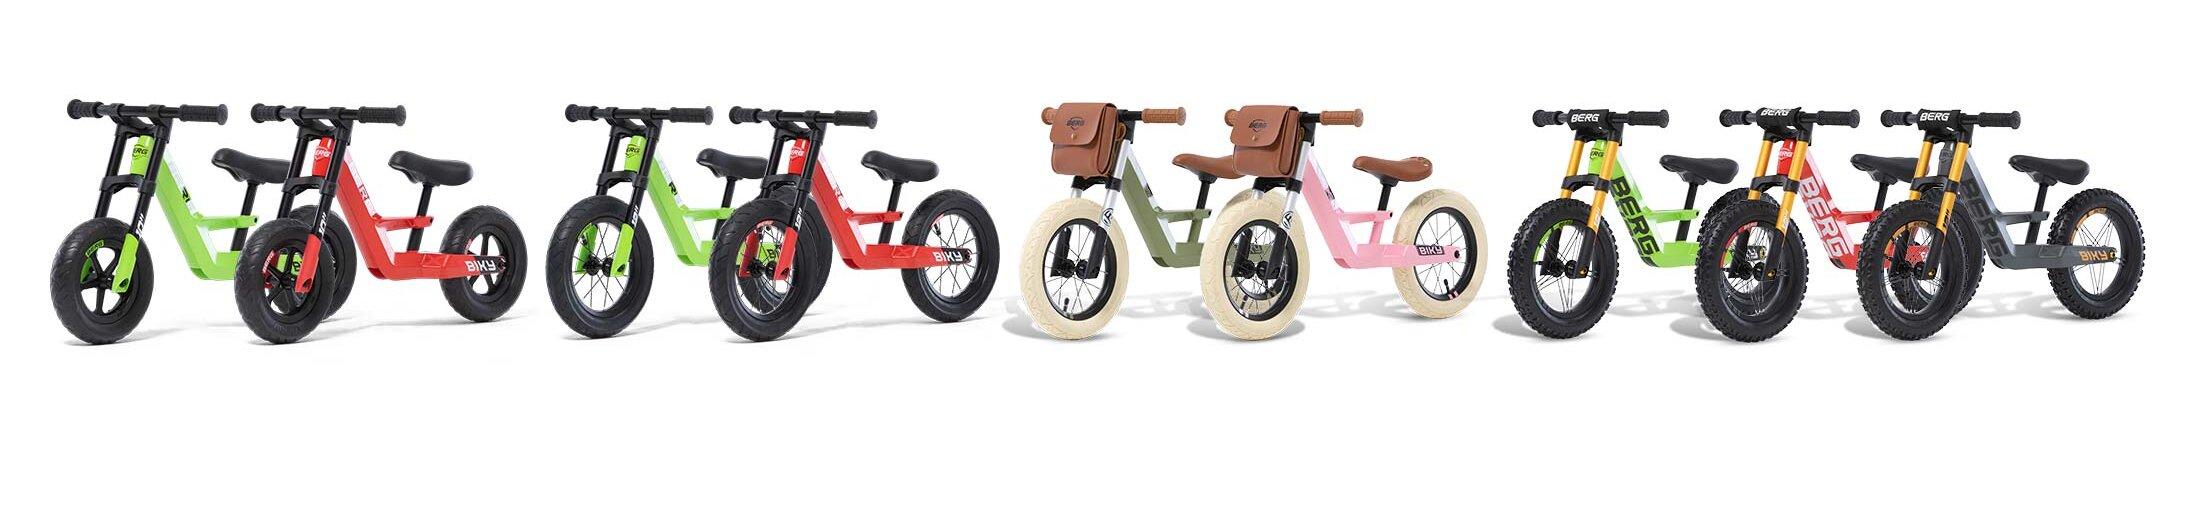 BERG Biky Laufräder kaufen bei gokart-profi.de